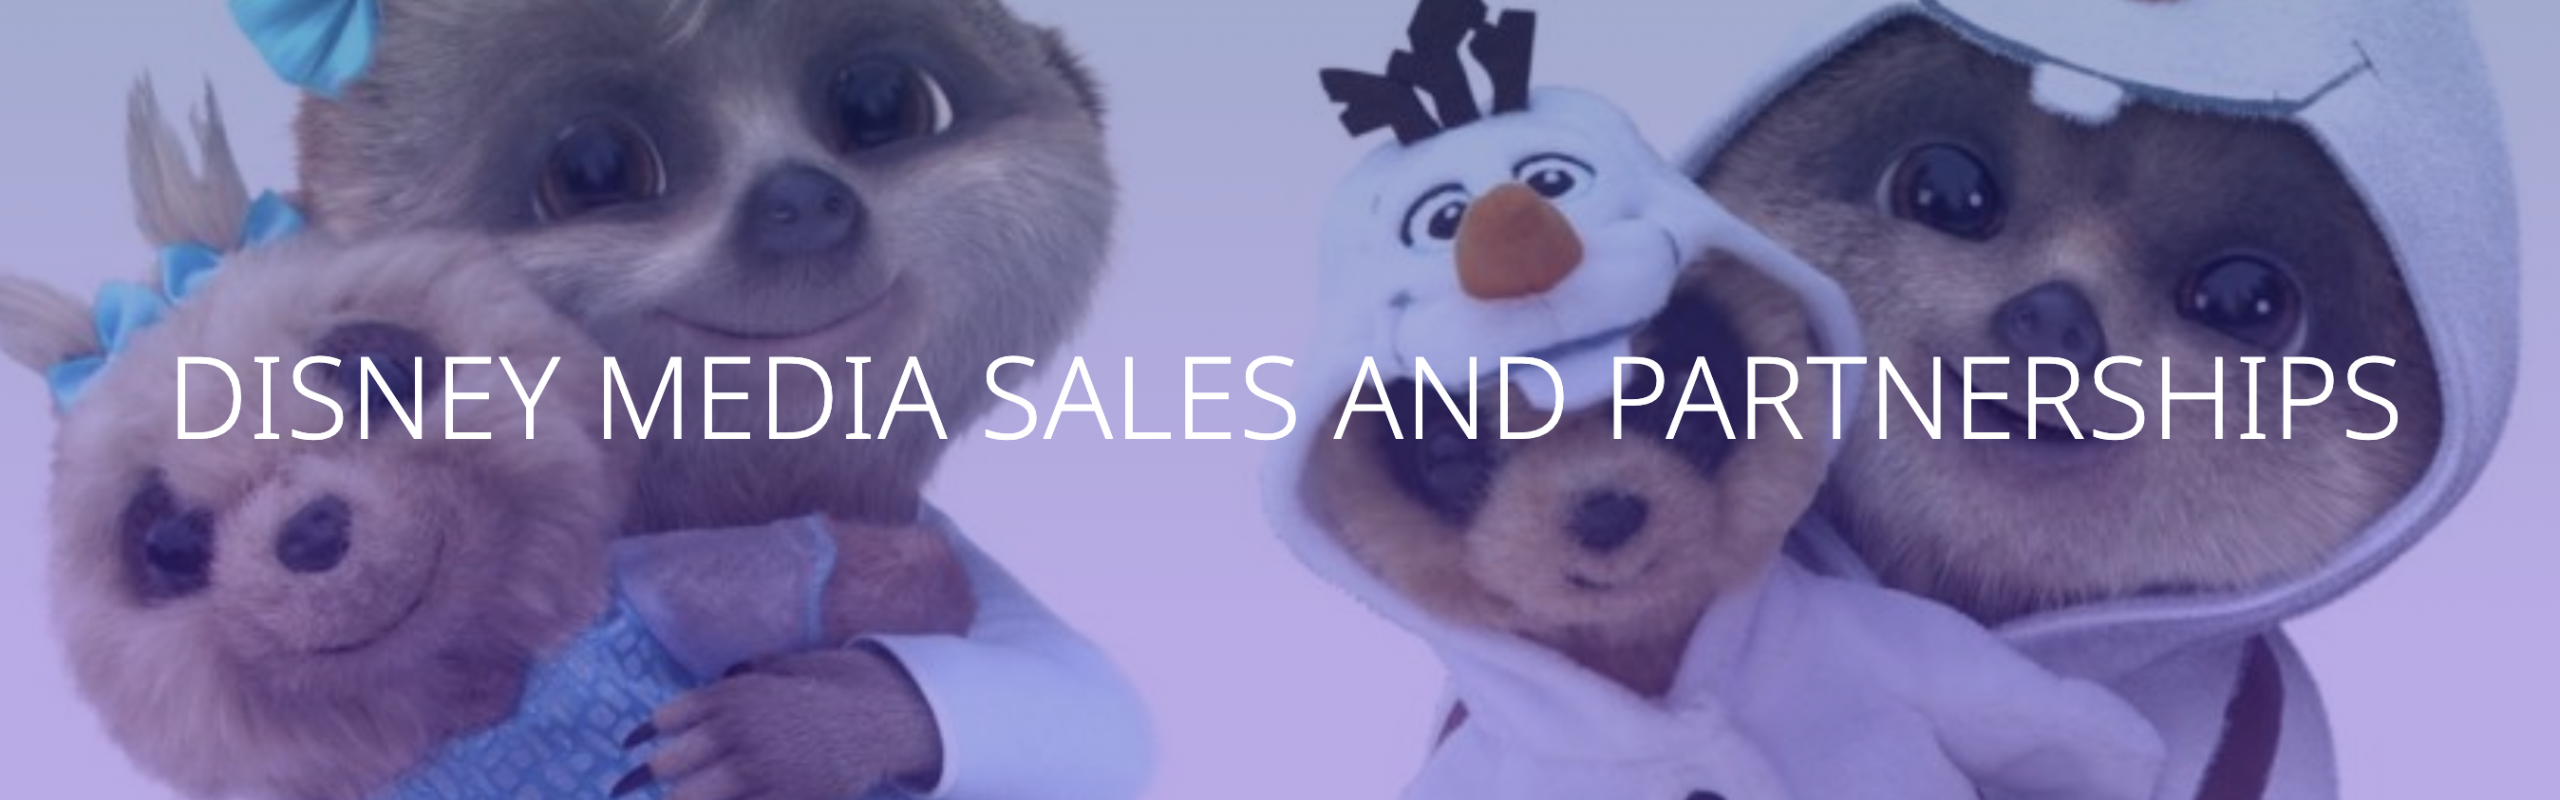 Disney Africa Media Sales and Partnerships